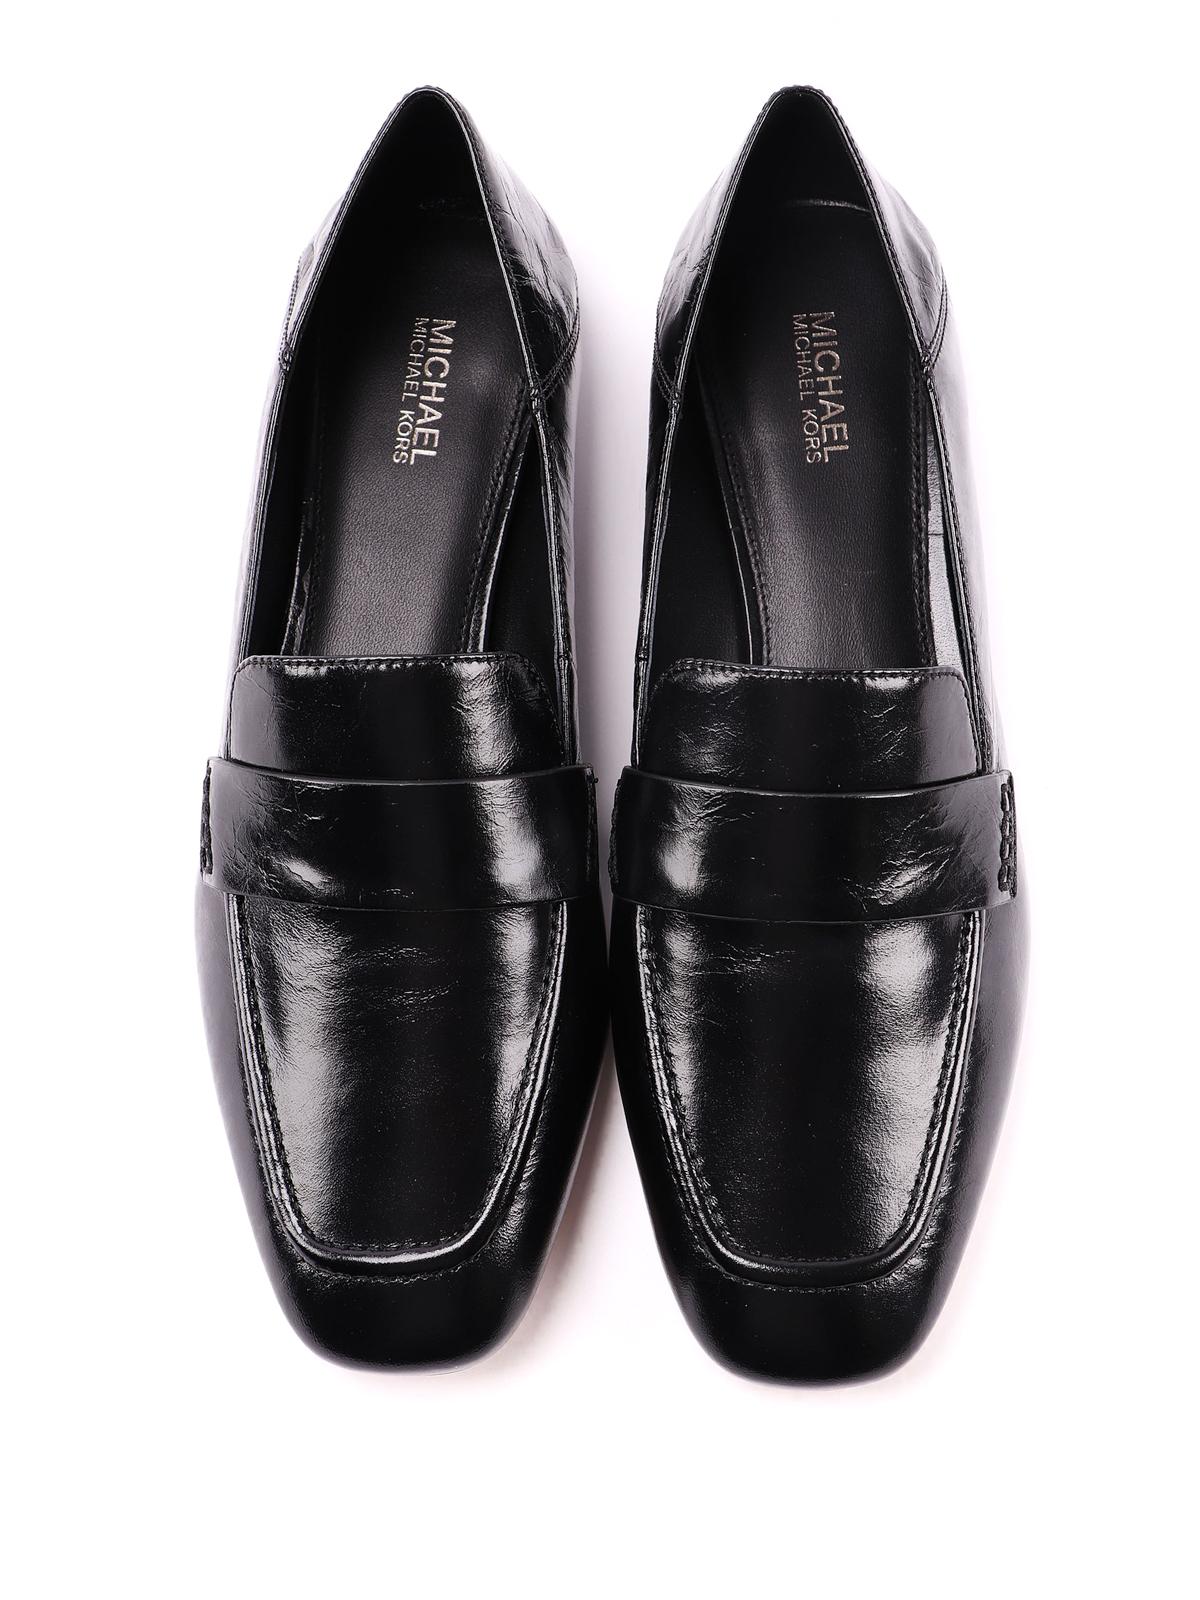 Michael Kors - Emory foldover heel